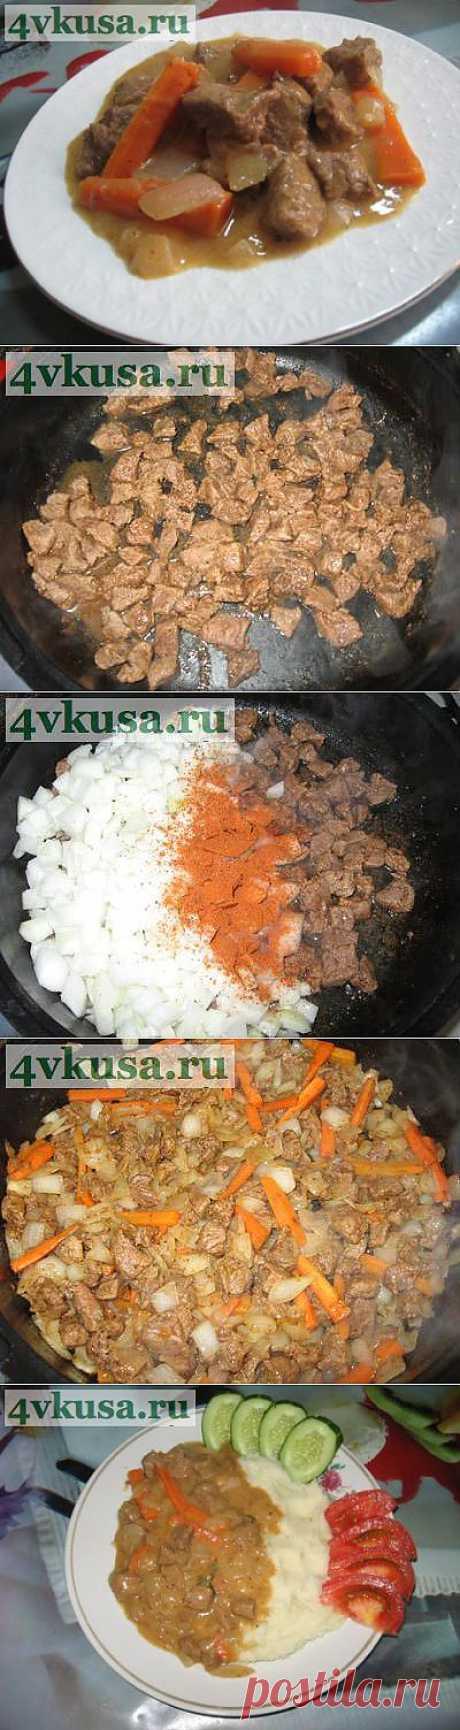 Либжэ (мясо тушеное по-кабардински). Фоторецепт. | 4vkusa.ru